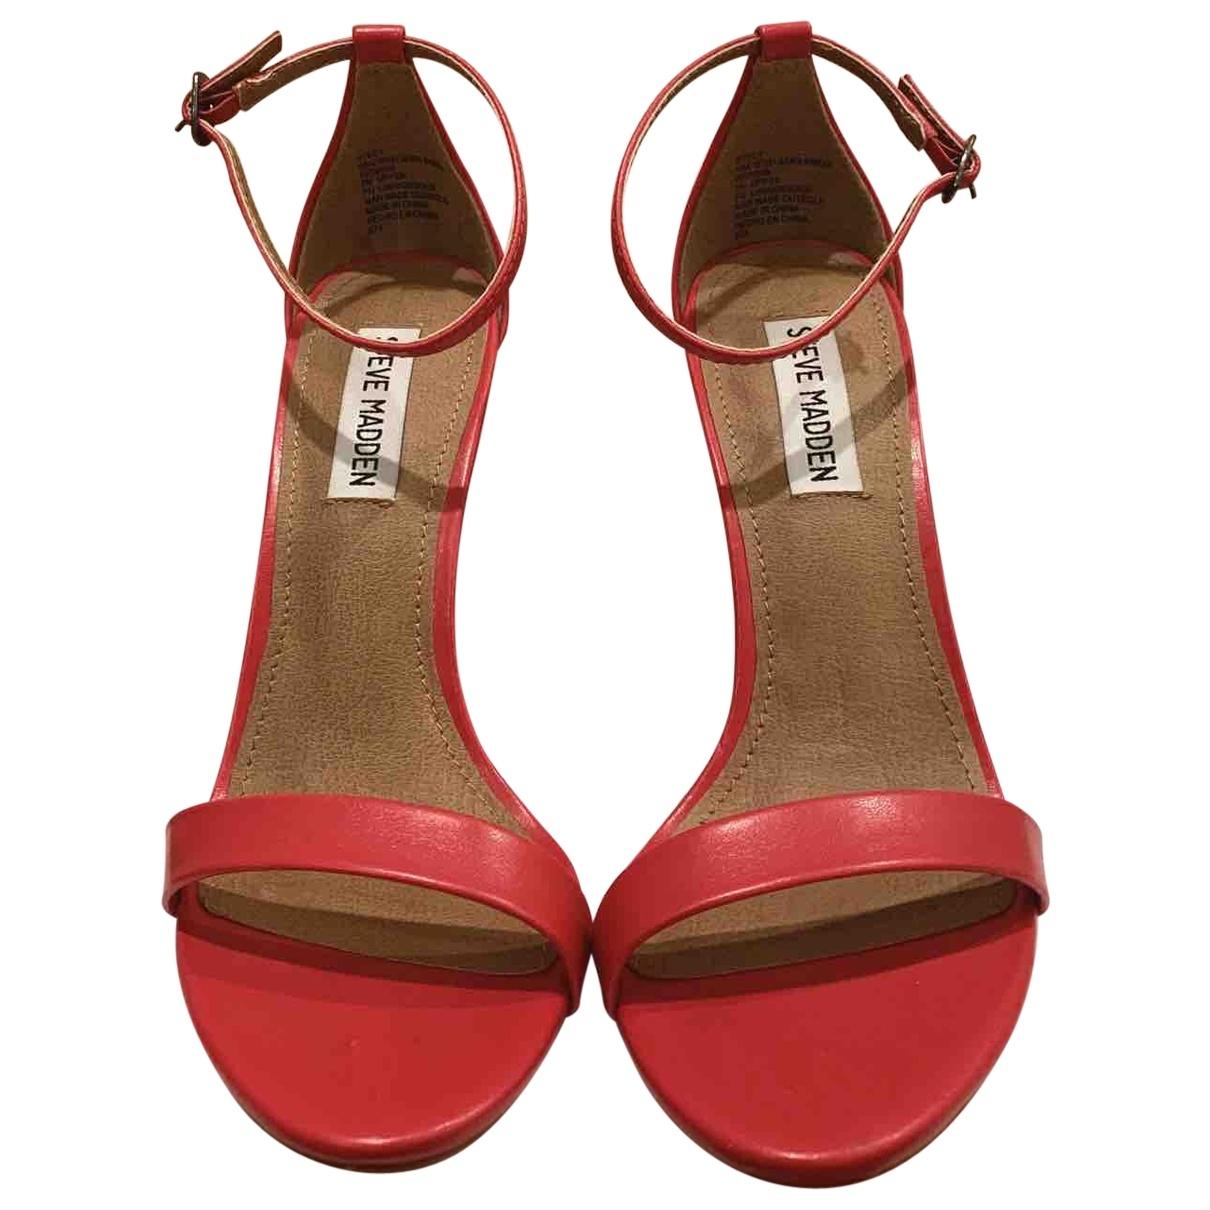 Steve Madden \N Red Leather Heels for Women 37.5 EU